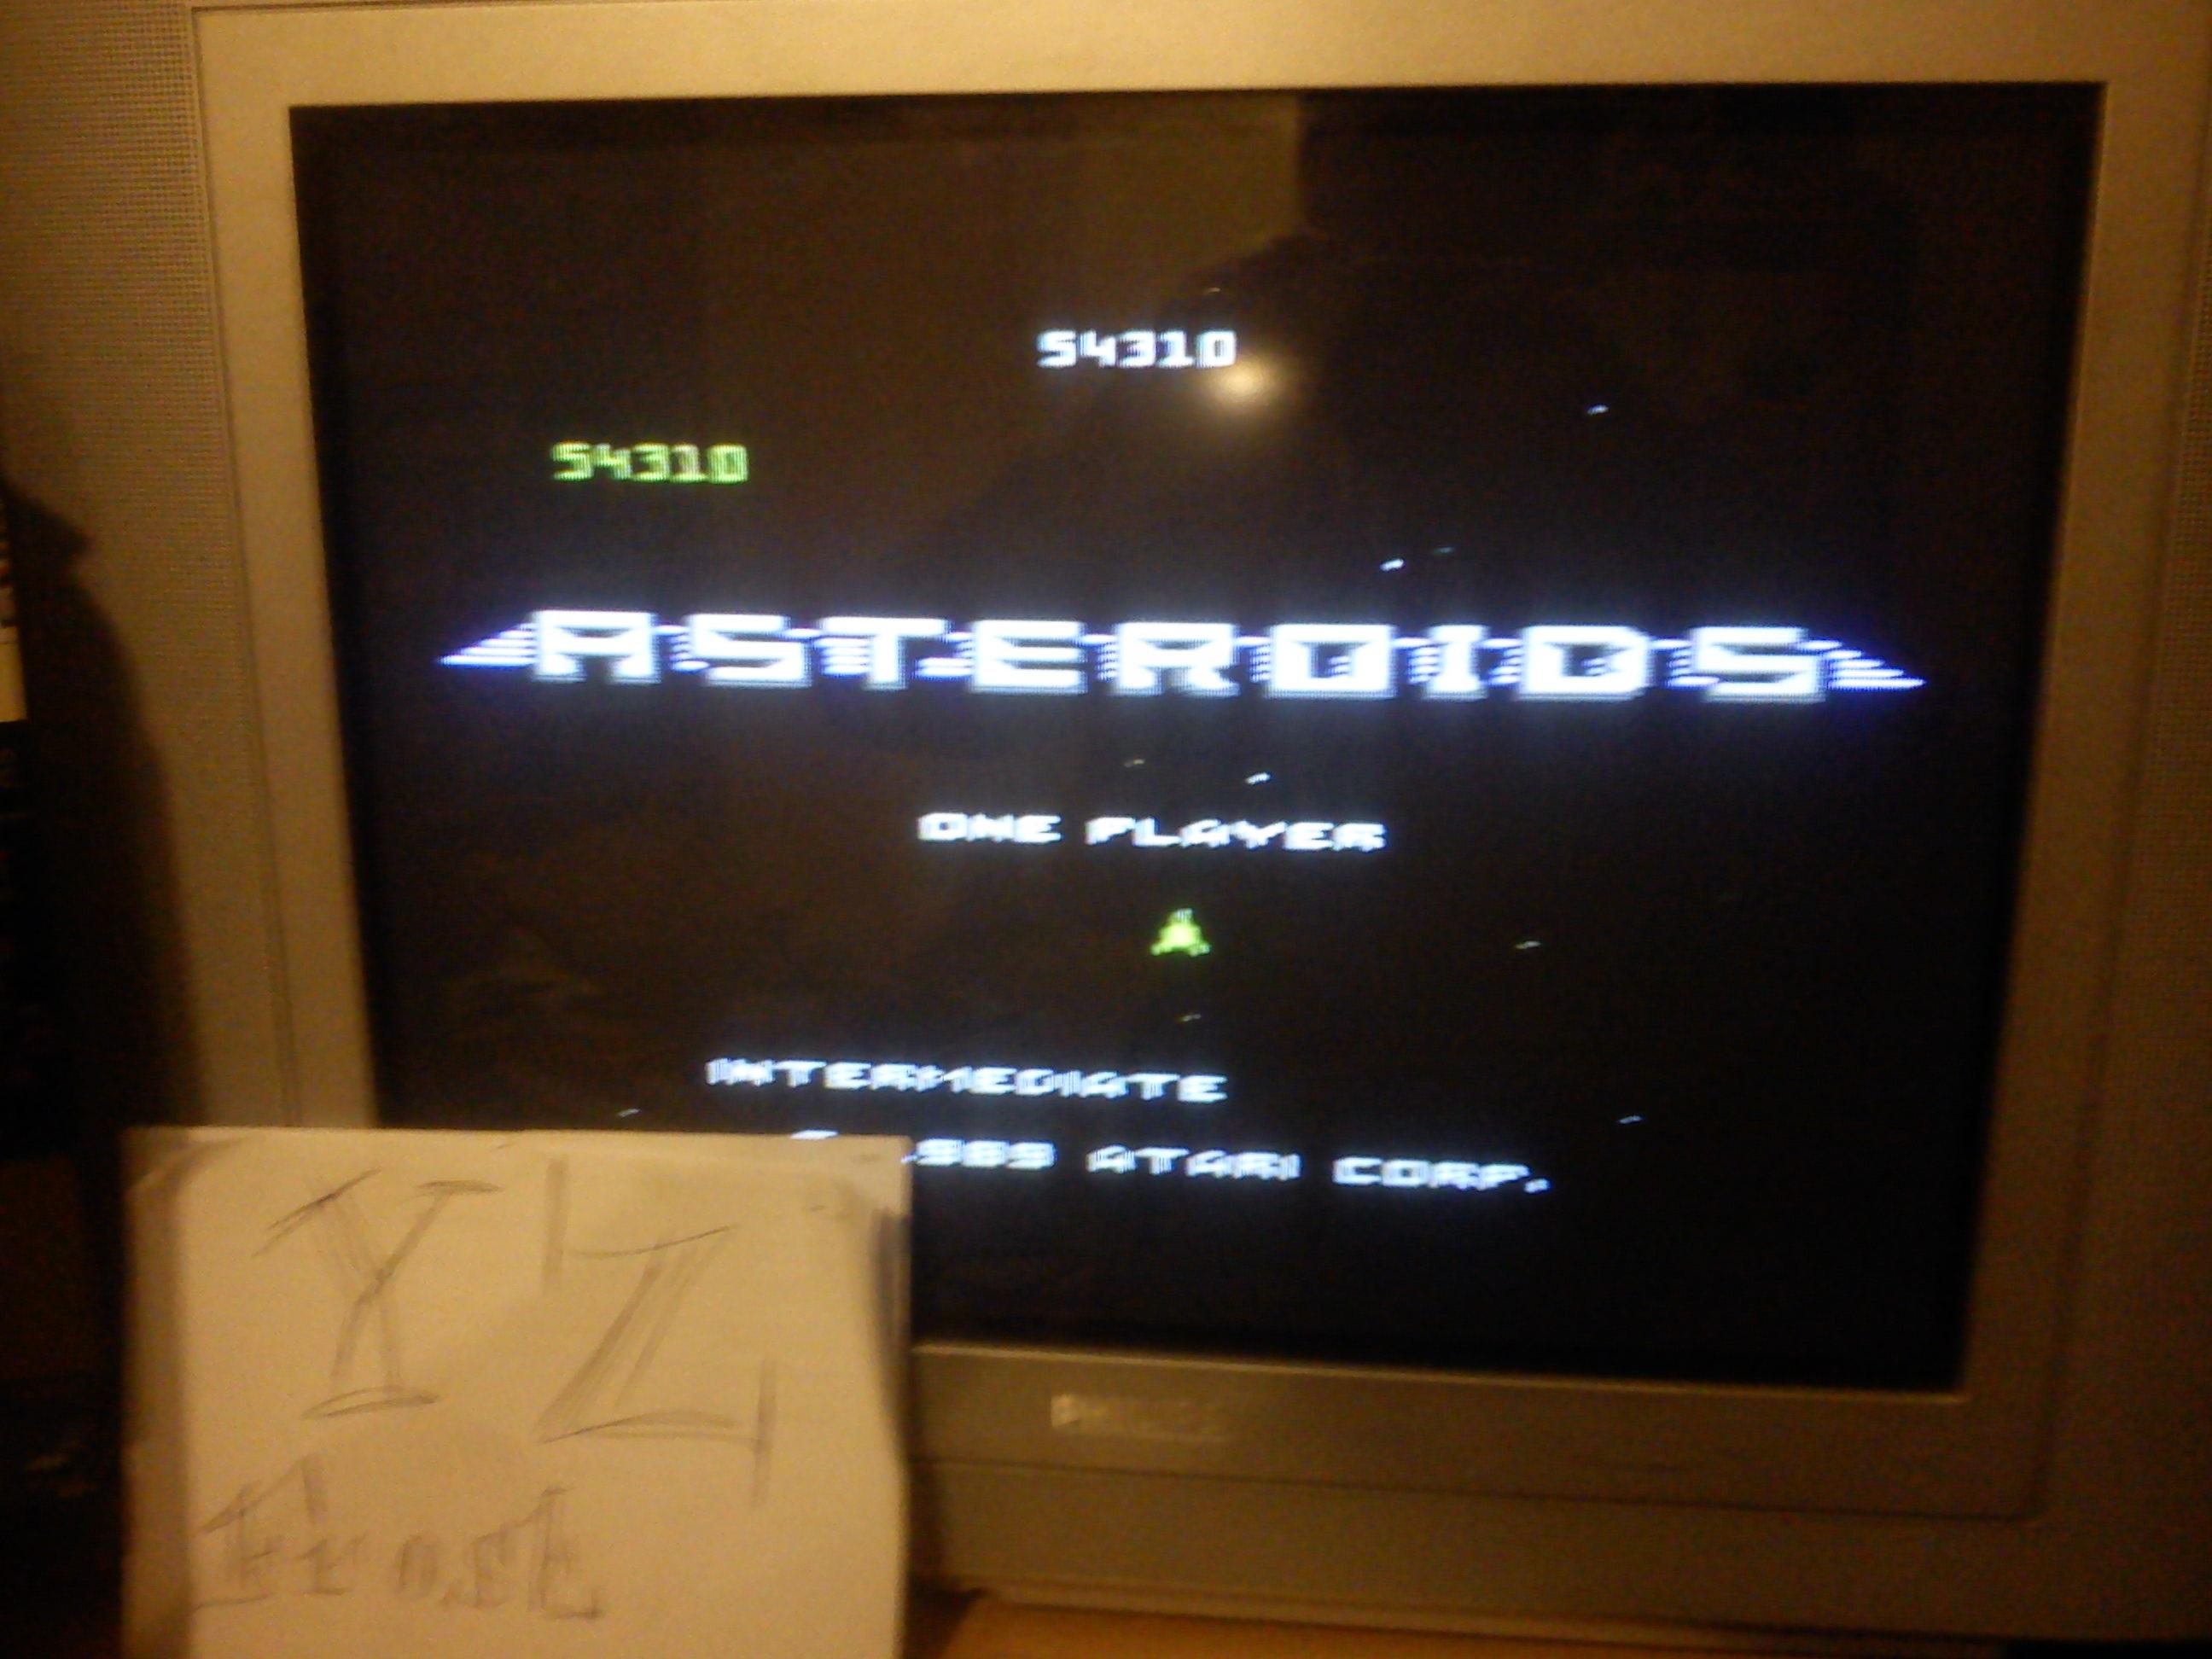 Fr0st: Asteroids: Intermediate (Atari 7800) 54,310 points on 2014-11-12 12:39:44